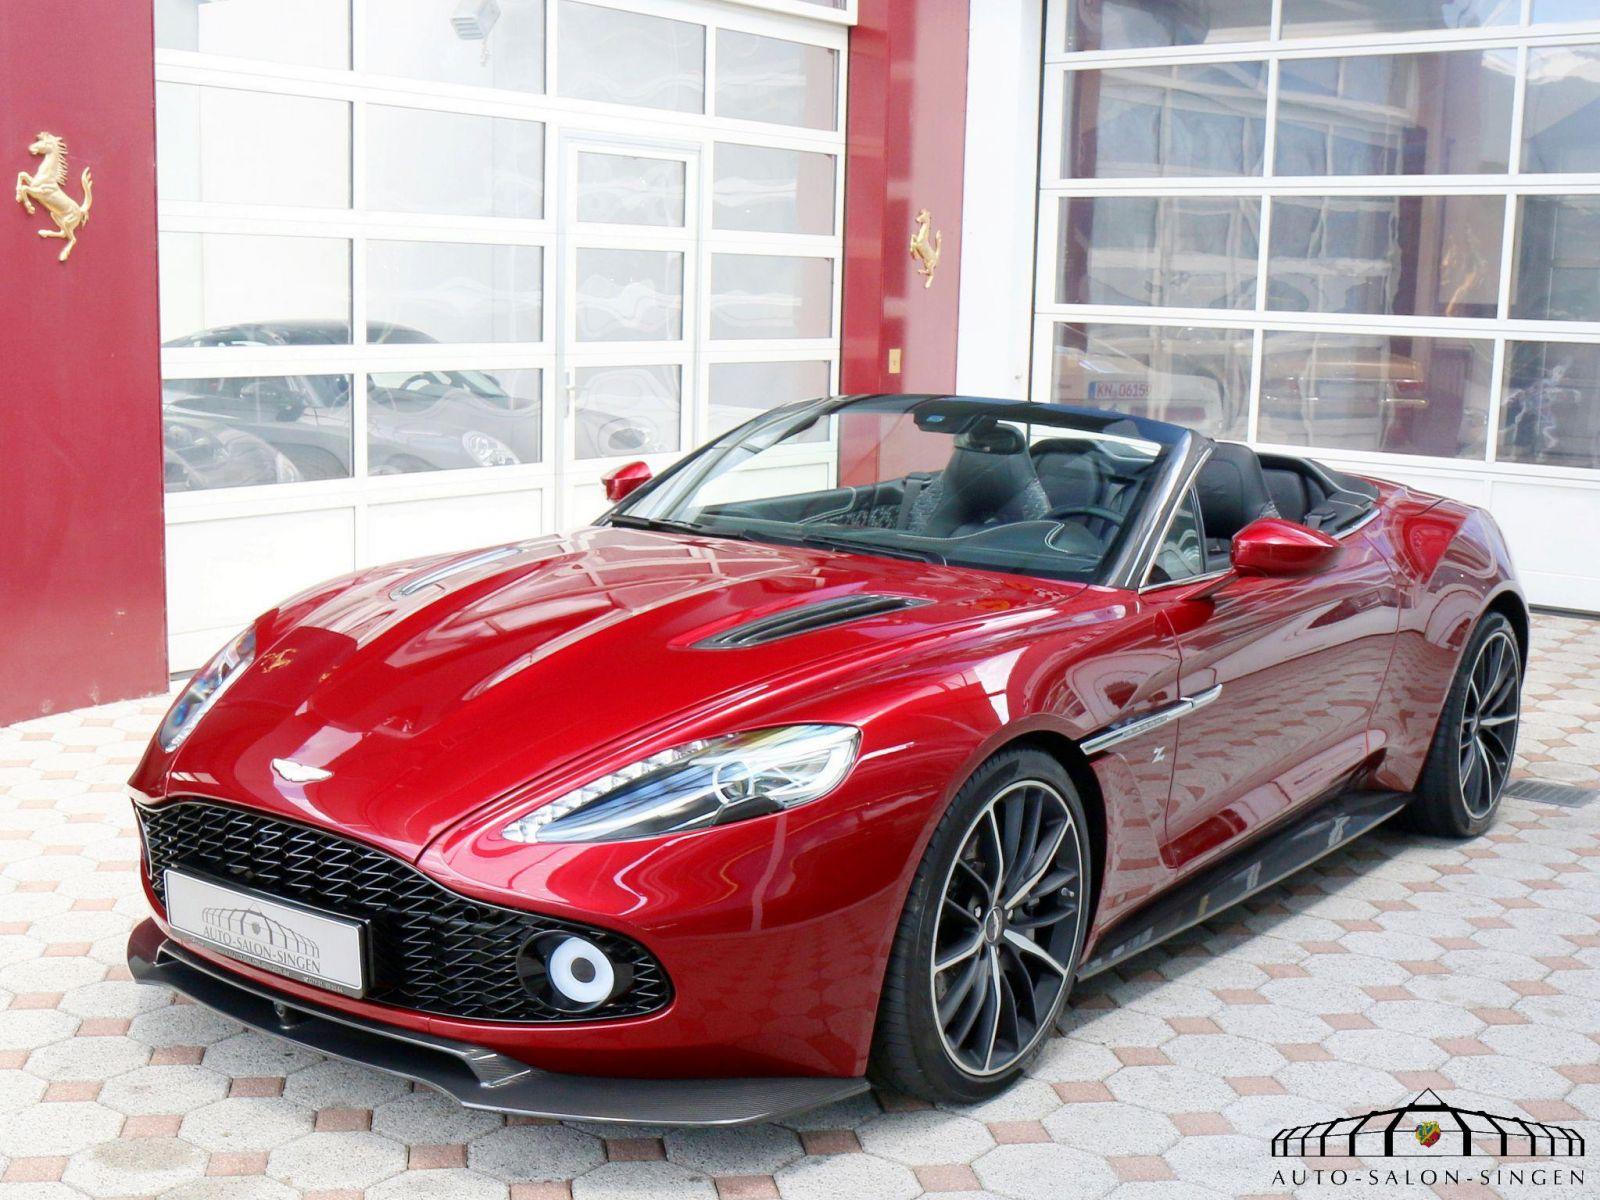 Aston Martin Vanquish Zagato Volante Station Wagon Auto Salon Singen